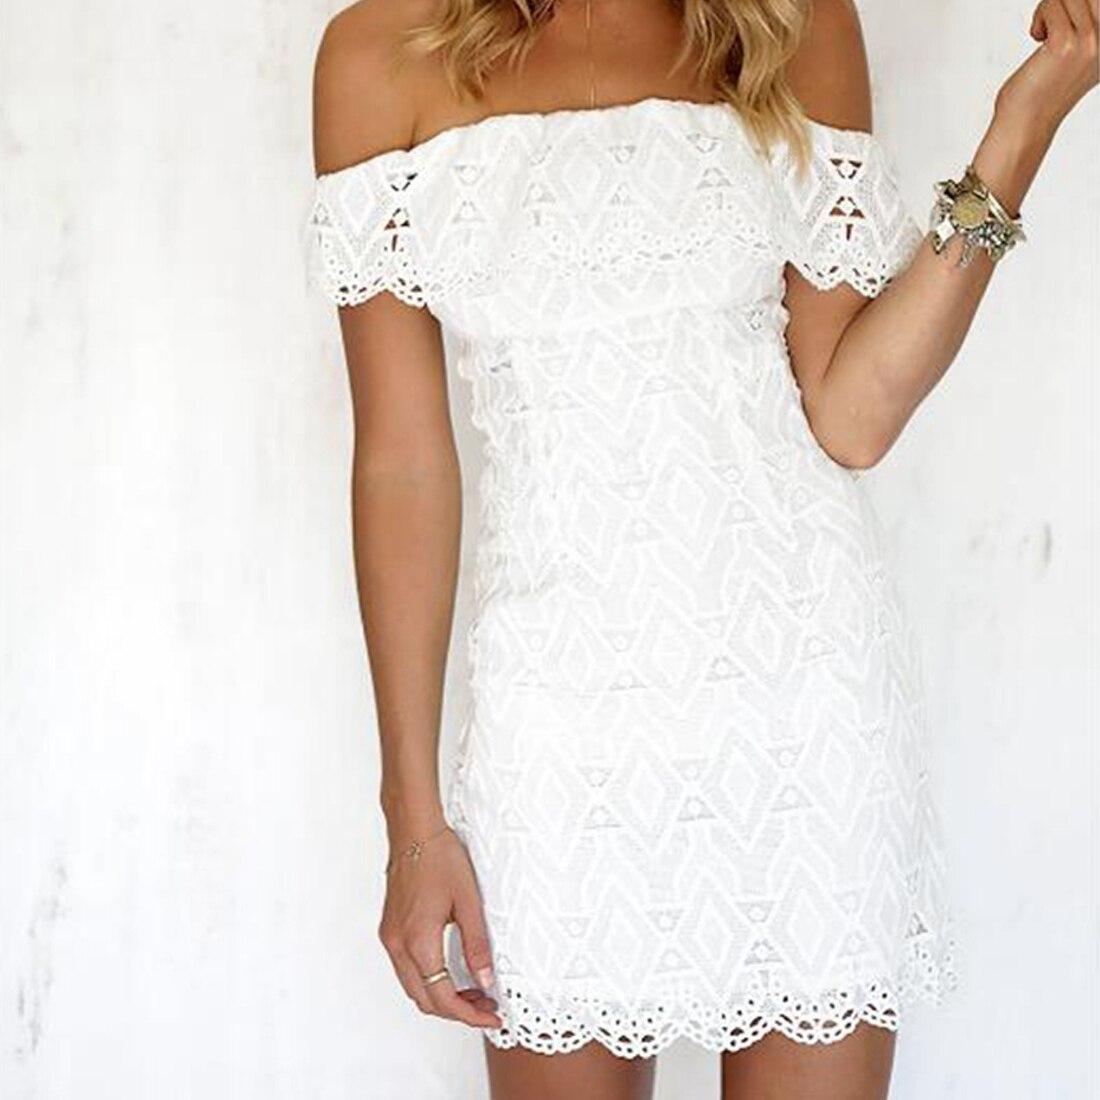 Yjsfg casa sólida branco fora do ombro curto vestidos de festa clube das mulheres verão magro bodycon lápis vestido 2017 senhoras rendas